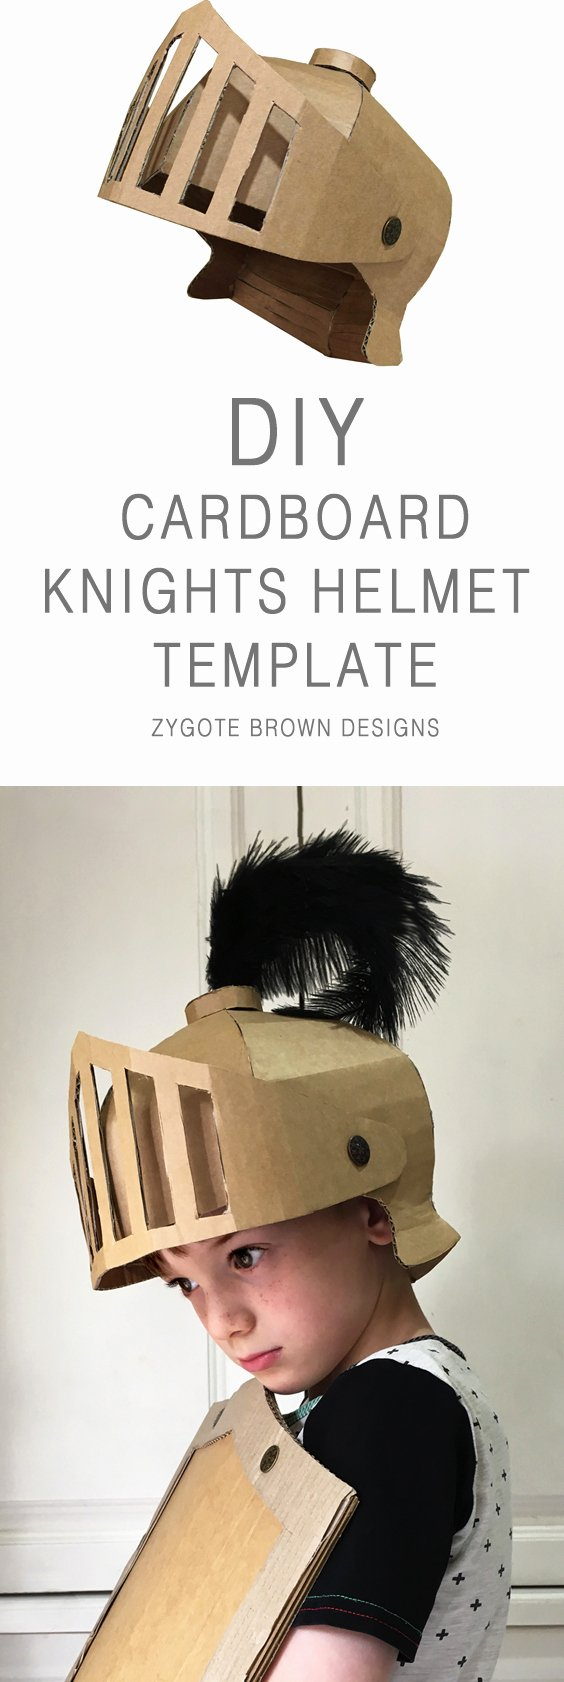 Cardboard Knight Helmet Template Beautiful Diy Cardboard Knights Helmet Template by Zygote Brown